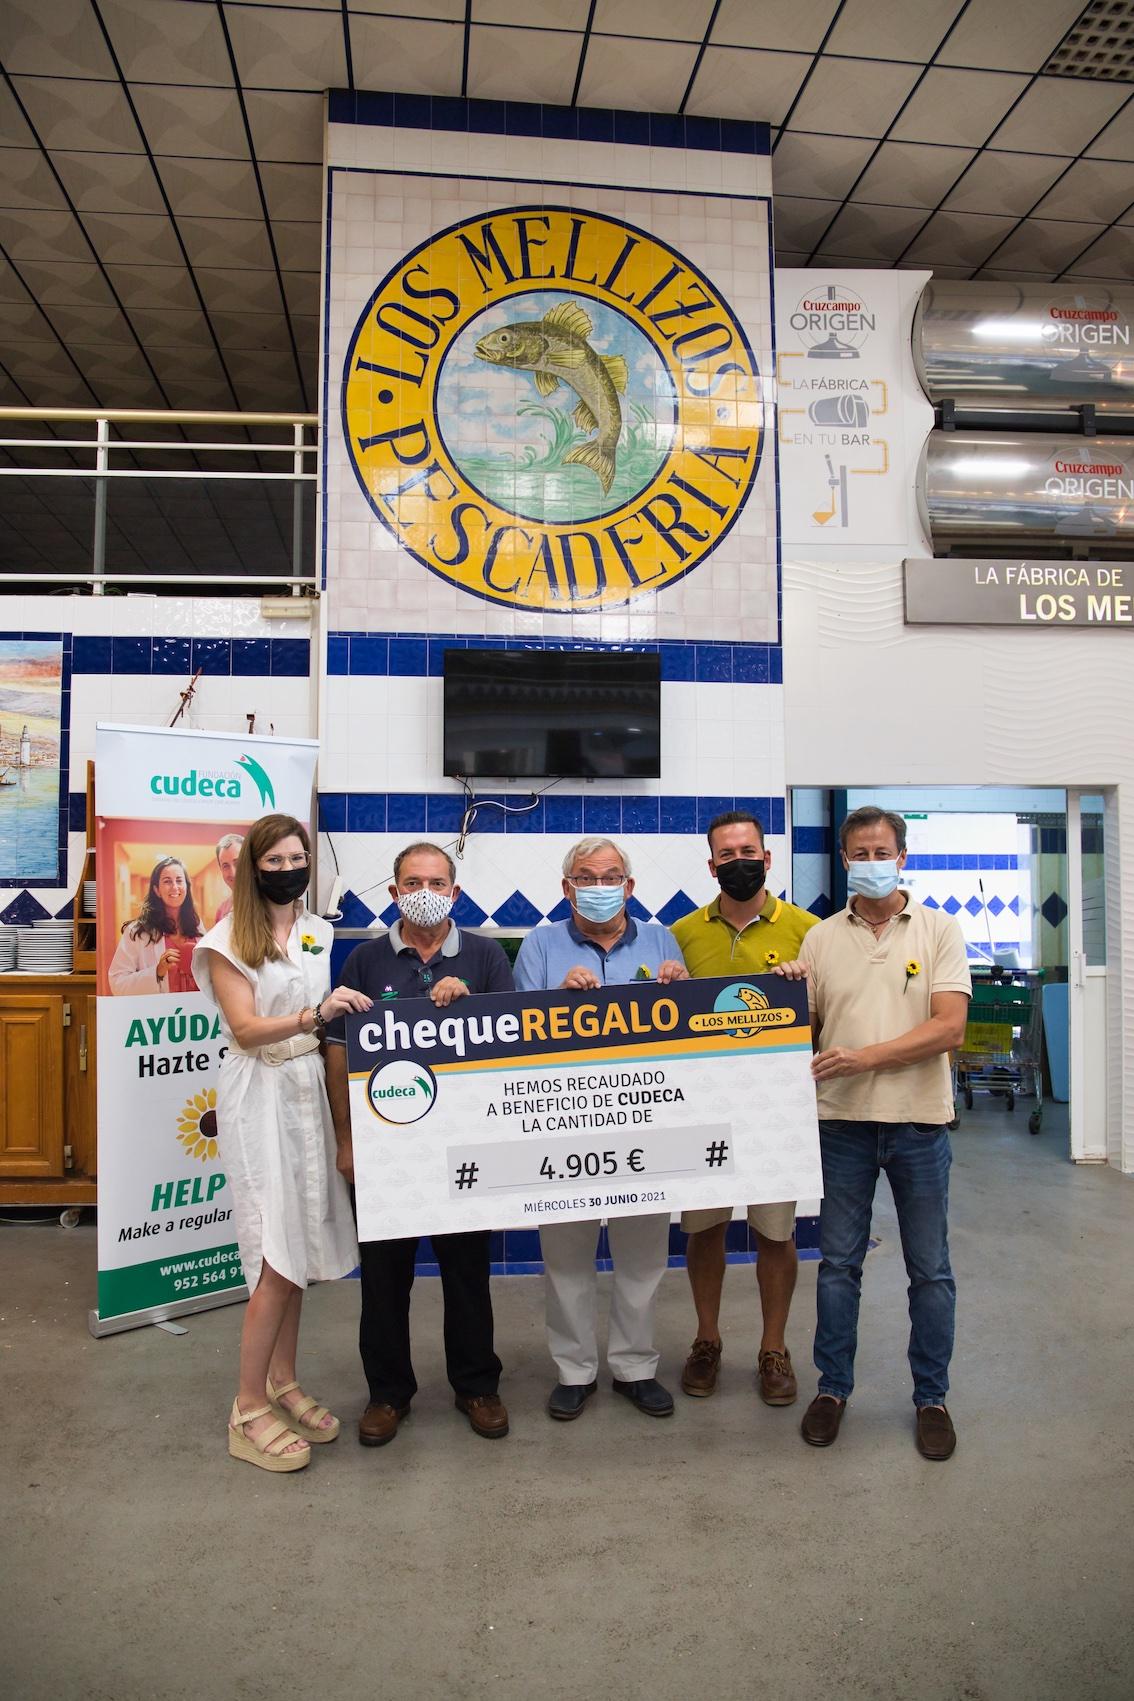 Los Mellizos Restaurants donate 4,905 euros to Cudeca in its Restaurants in Solidarity campaign.